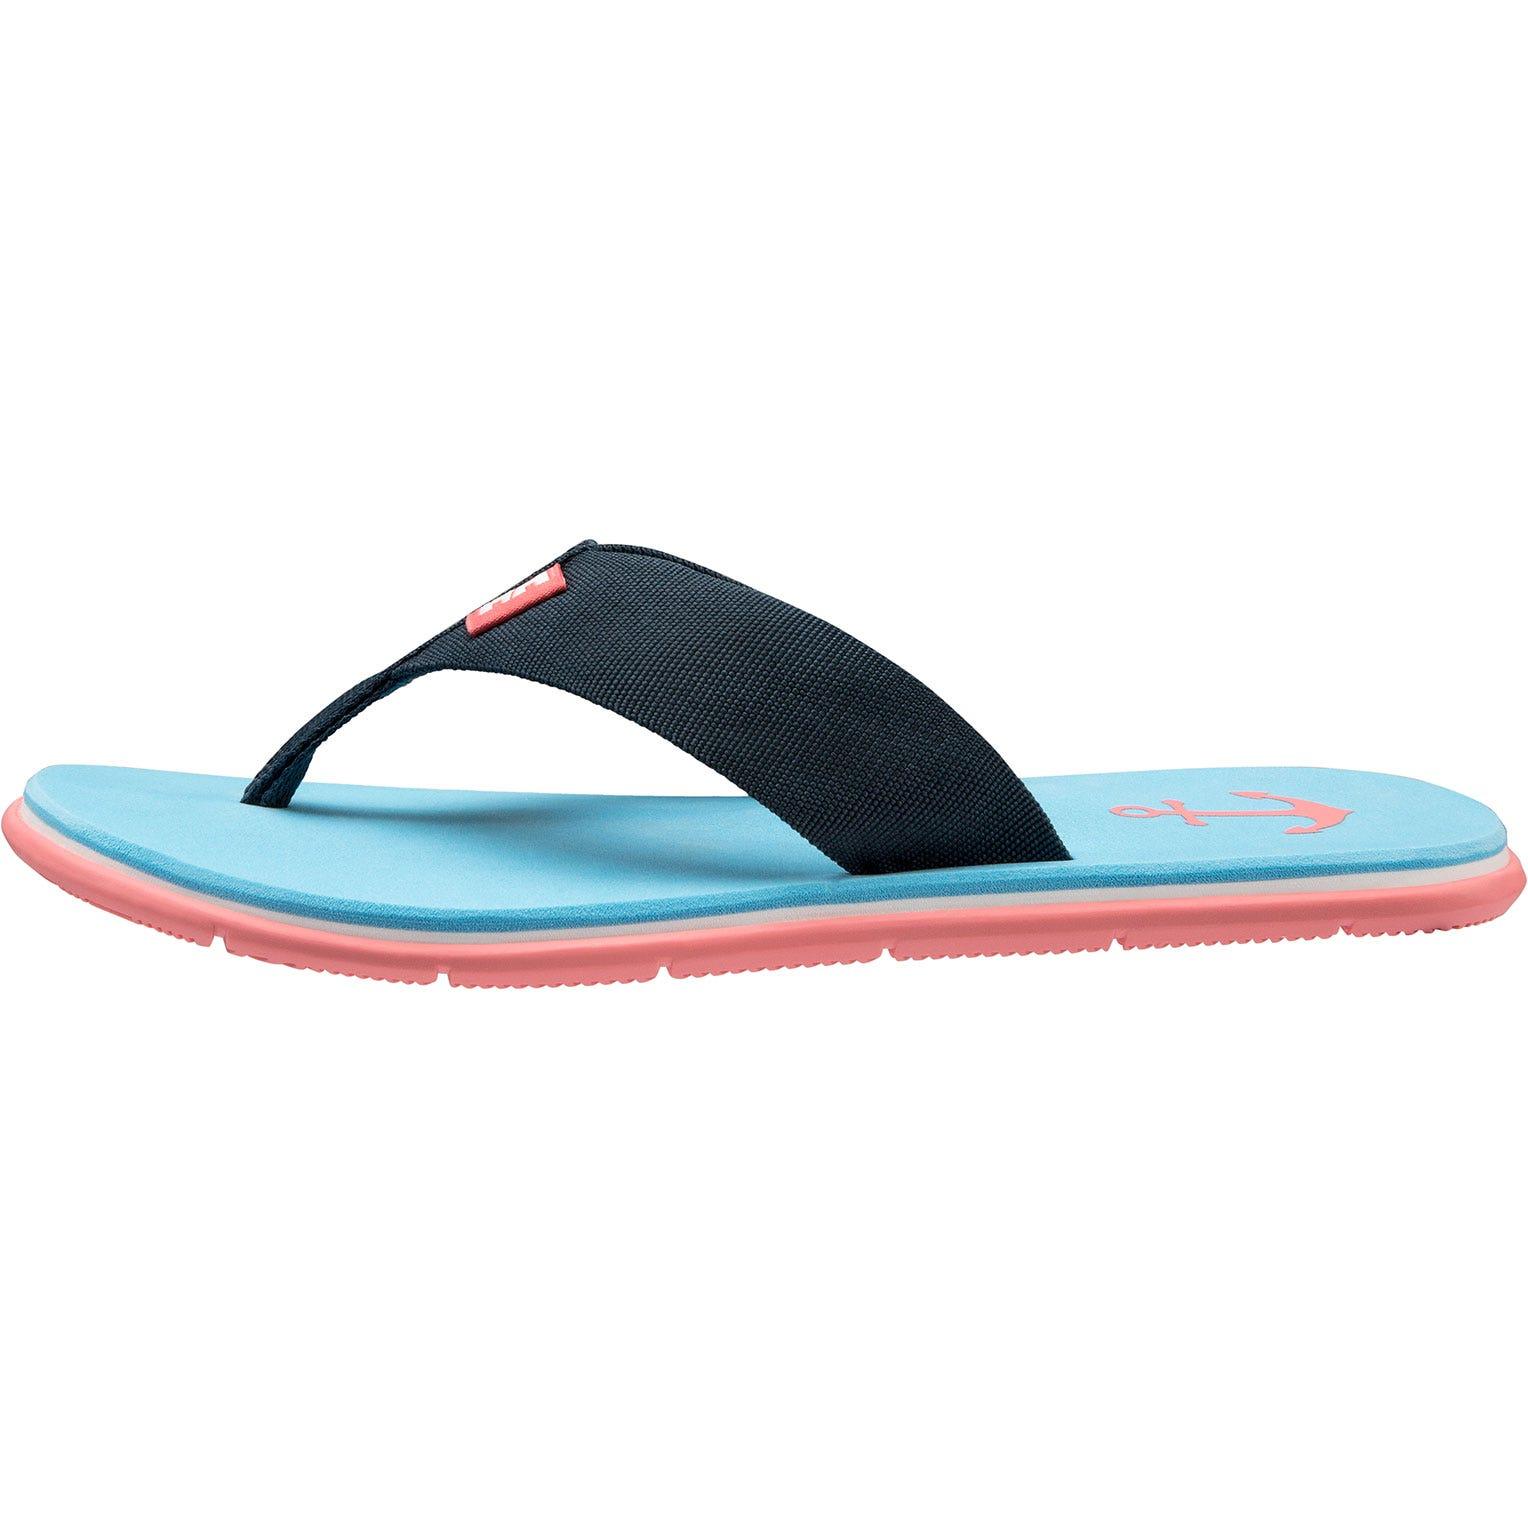 e4ee250195d481 W seasand marine sportswear sailing women jpg 1528x1528 Helly hansen flip  flops